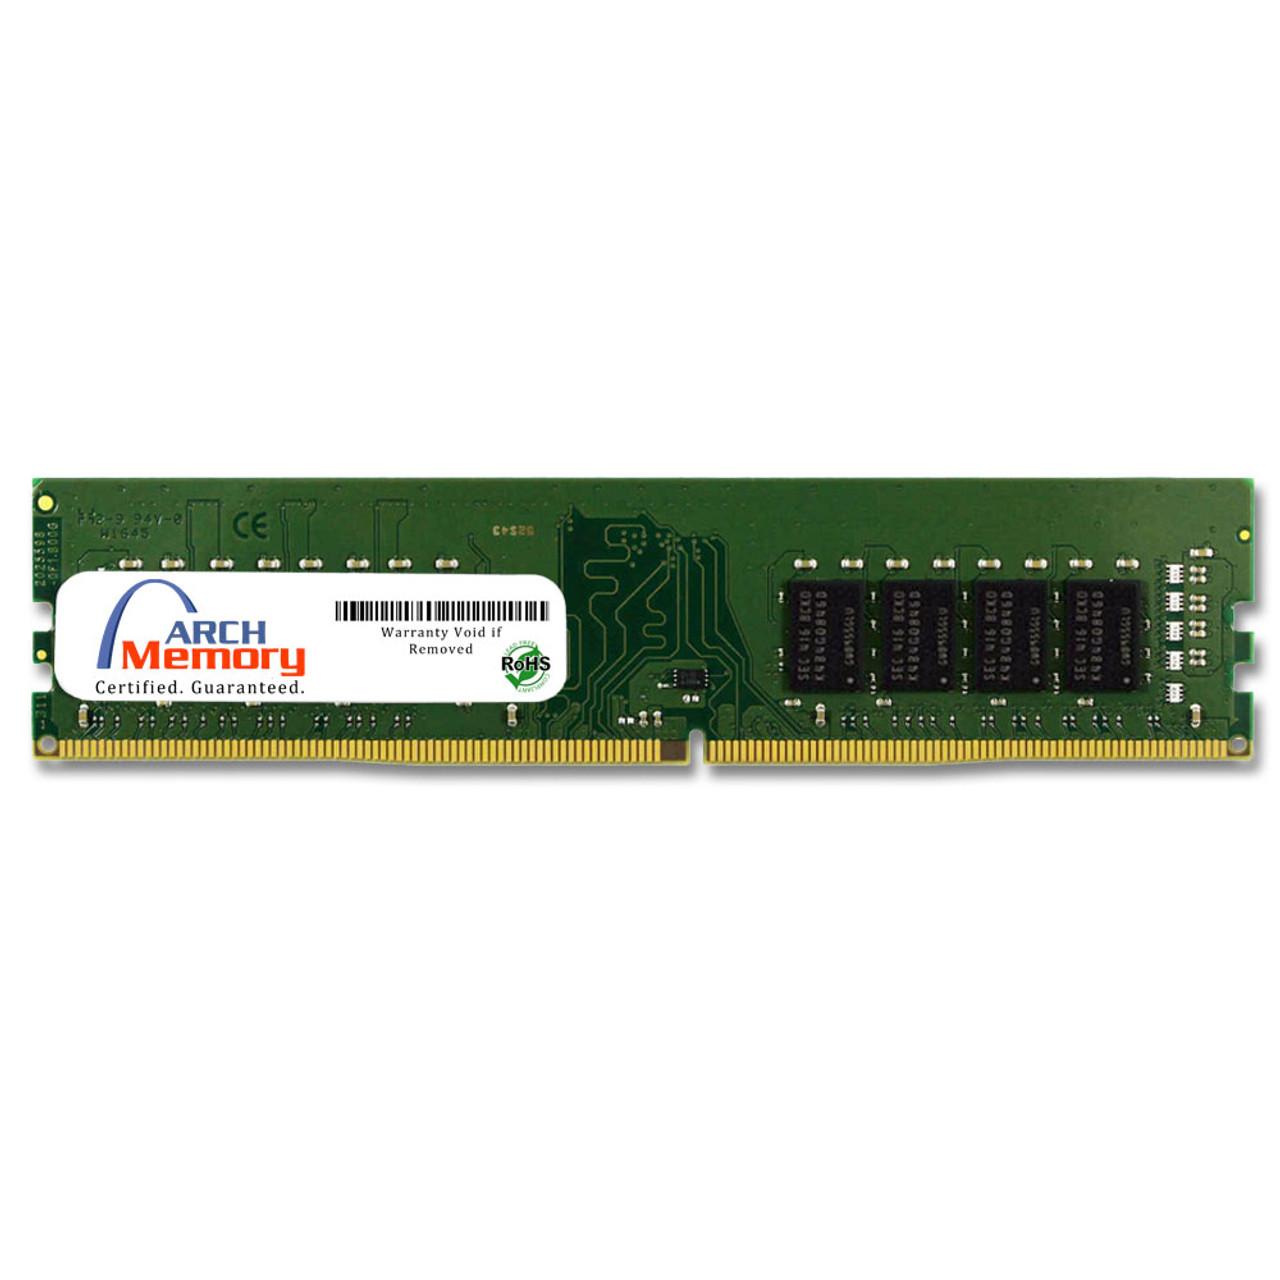 8GB DDR4-2400 PC4-19200 288-Pin Desktop RAM Memory